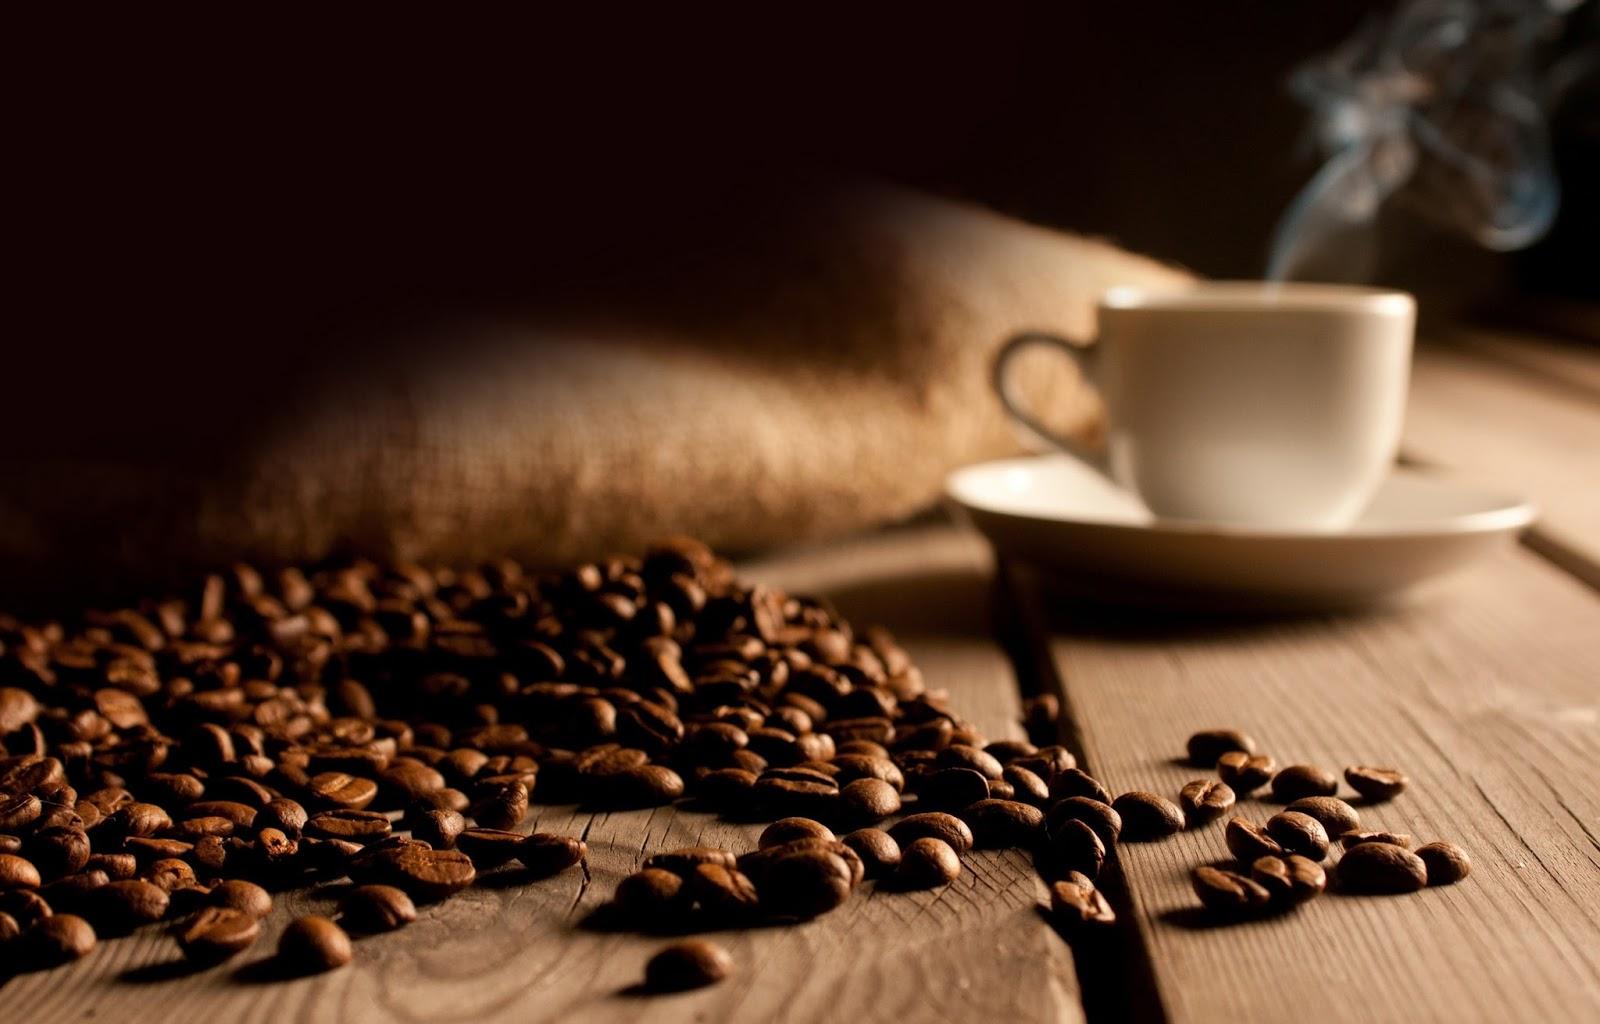 Coffee HD Wallpapers free download, Bulk Coffee Photography HD wallpapers 1080p free download , Photography Full HD .